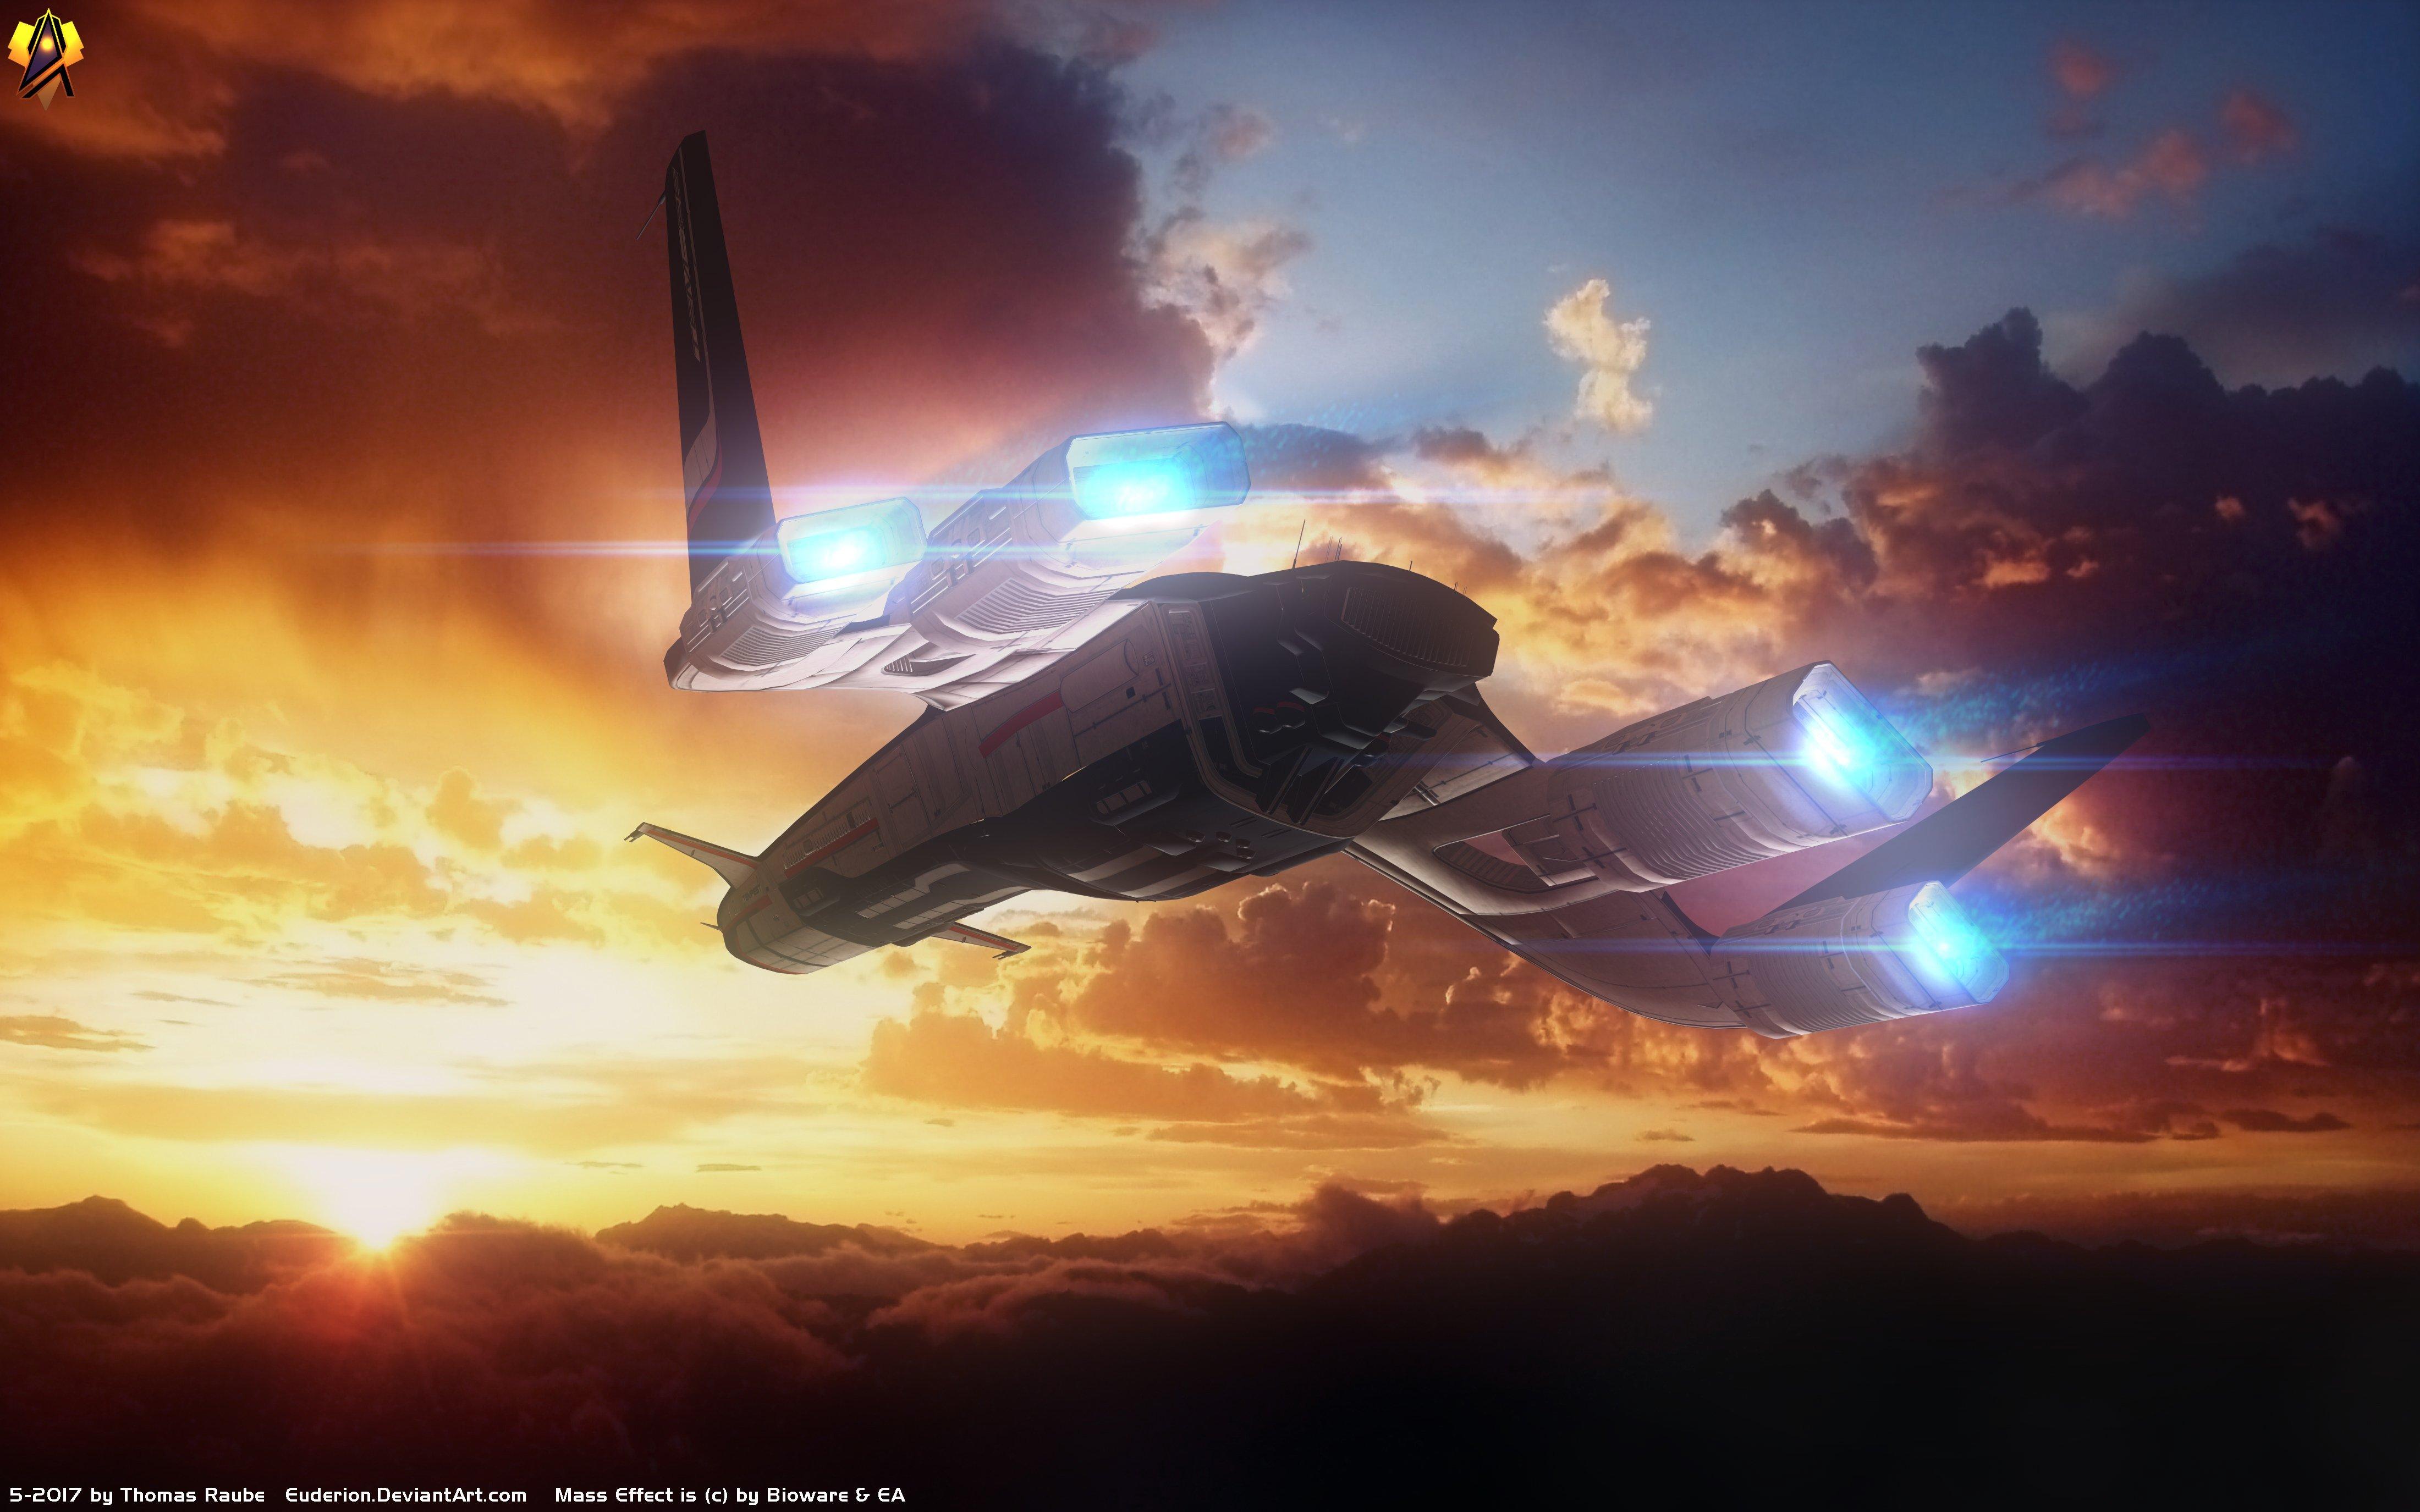 Wallpaper 4400x2750 Px Andromeda Initiative Mass Effect